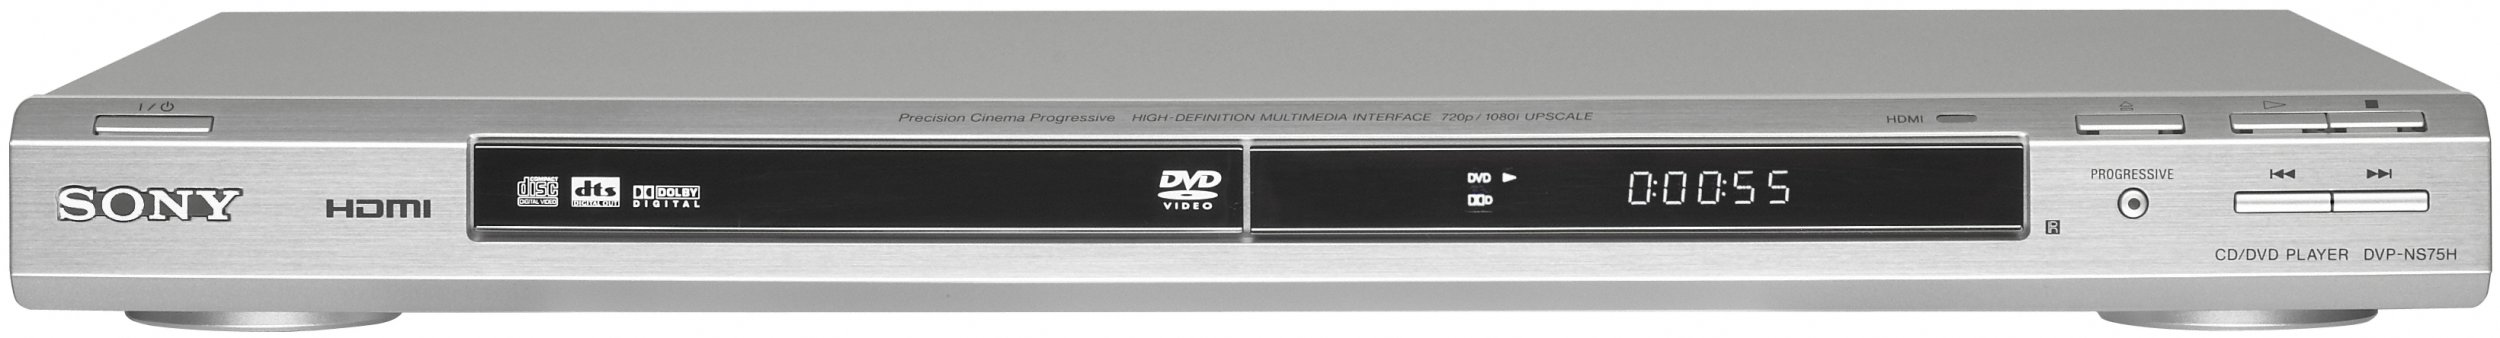 Sony DVPNS75H Single Disc Upscaling DVD Player